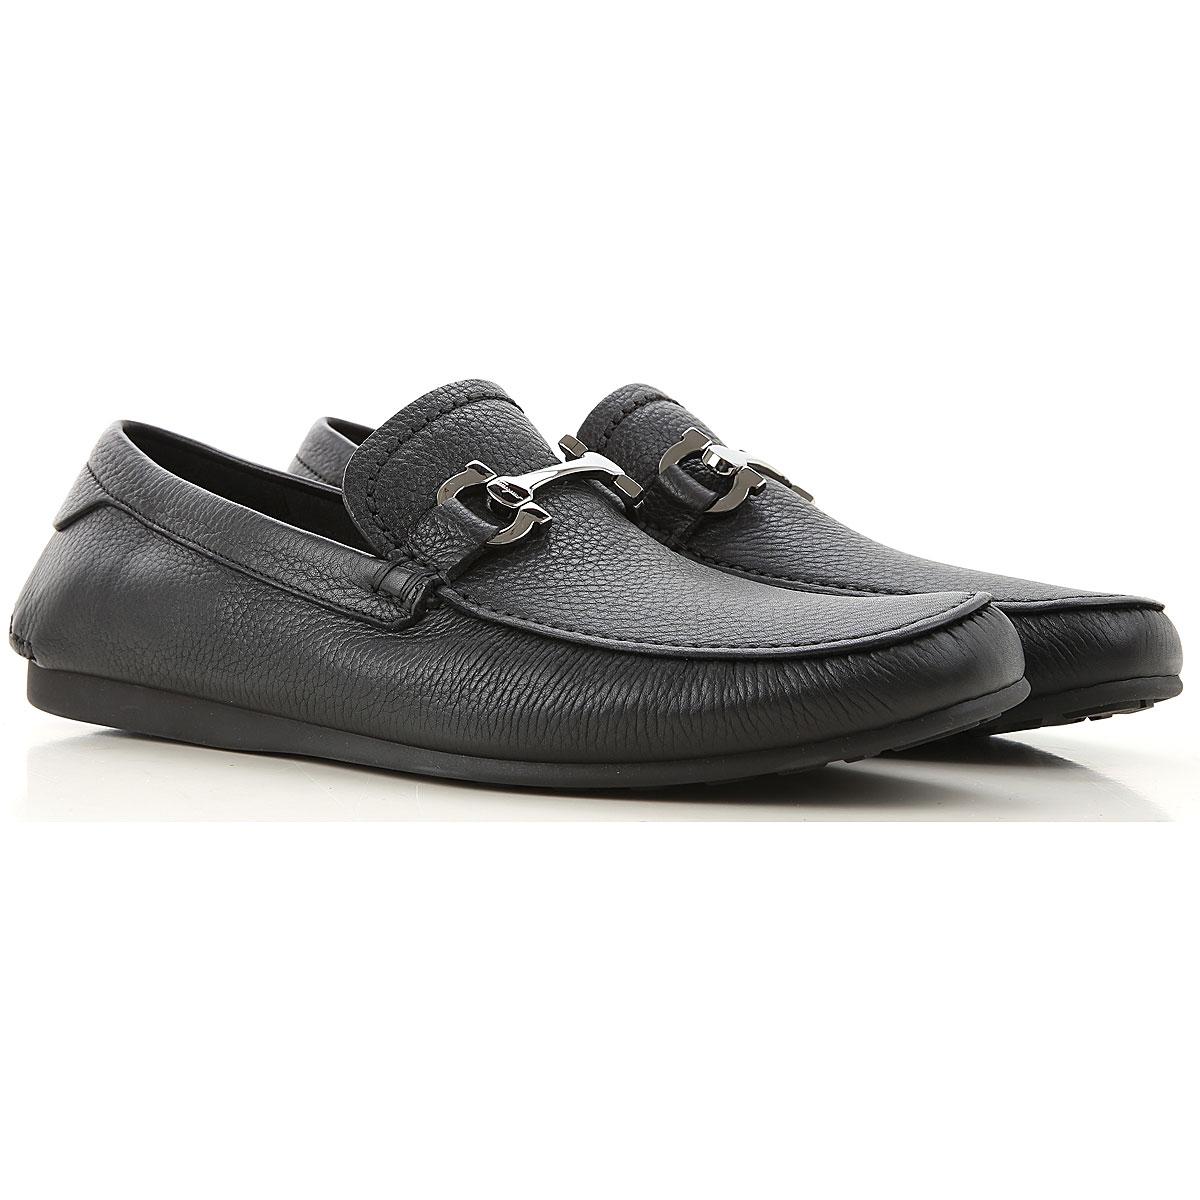 Salvatore Ferragamo Loafers for Men On Sale, Black, Leather, 2019, 8 8.5